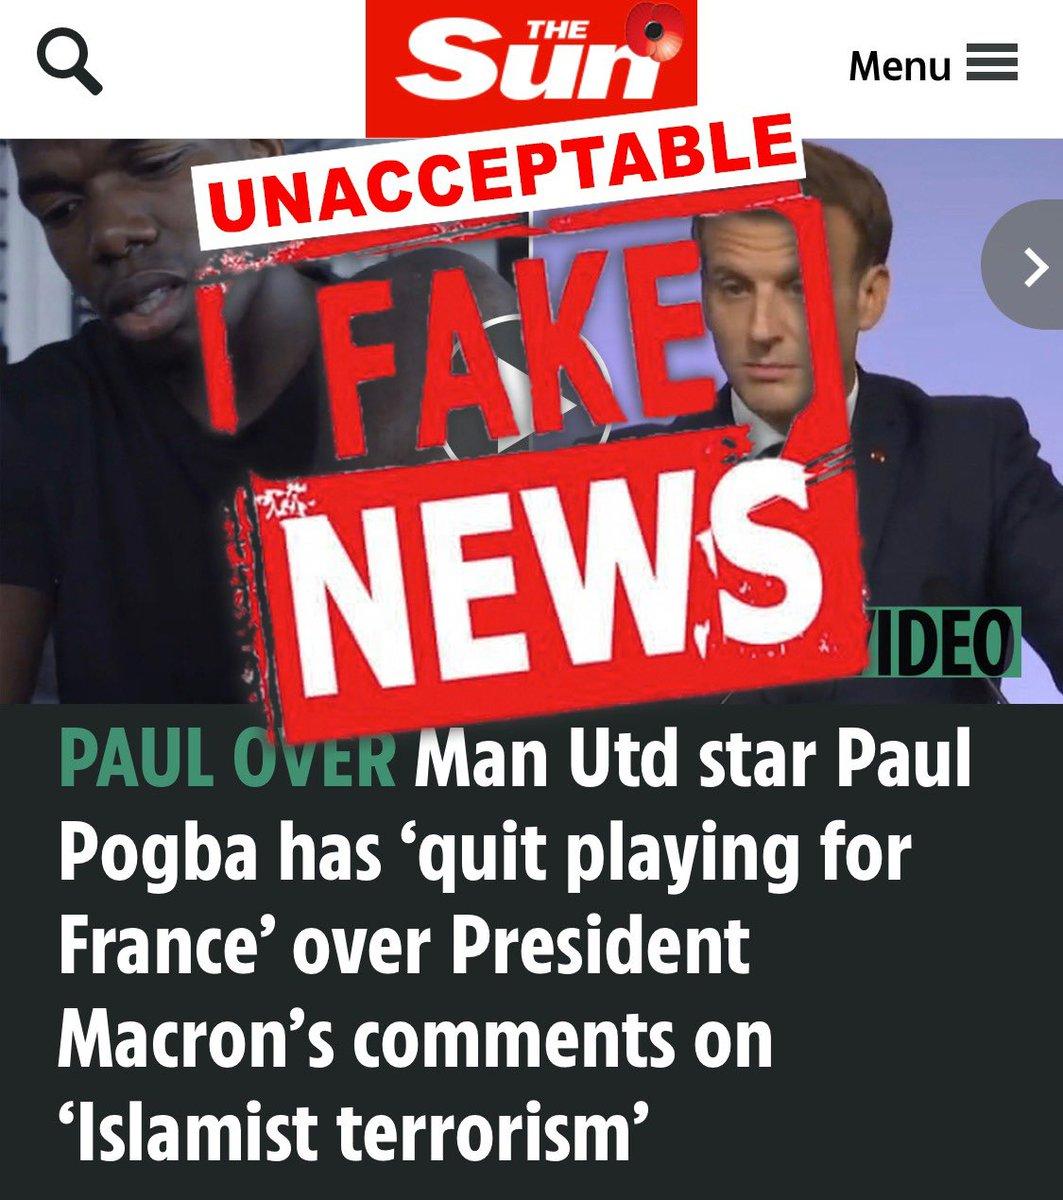 Paul Pogba (@paulpogba) on Twitter photo 2020-10-26 11:50:21